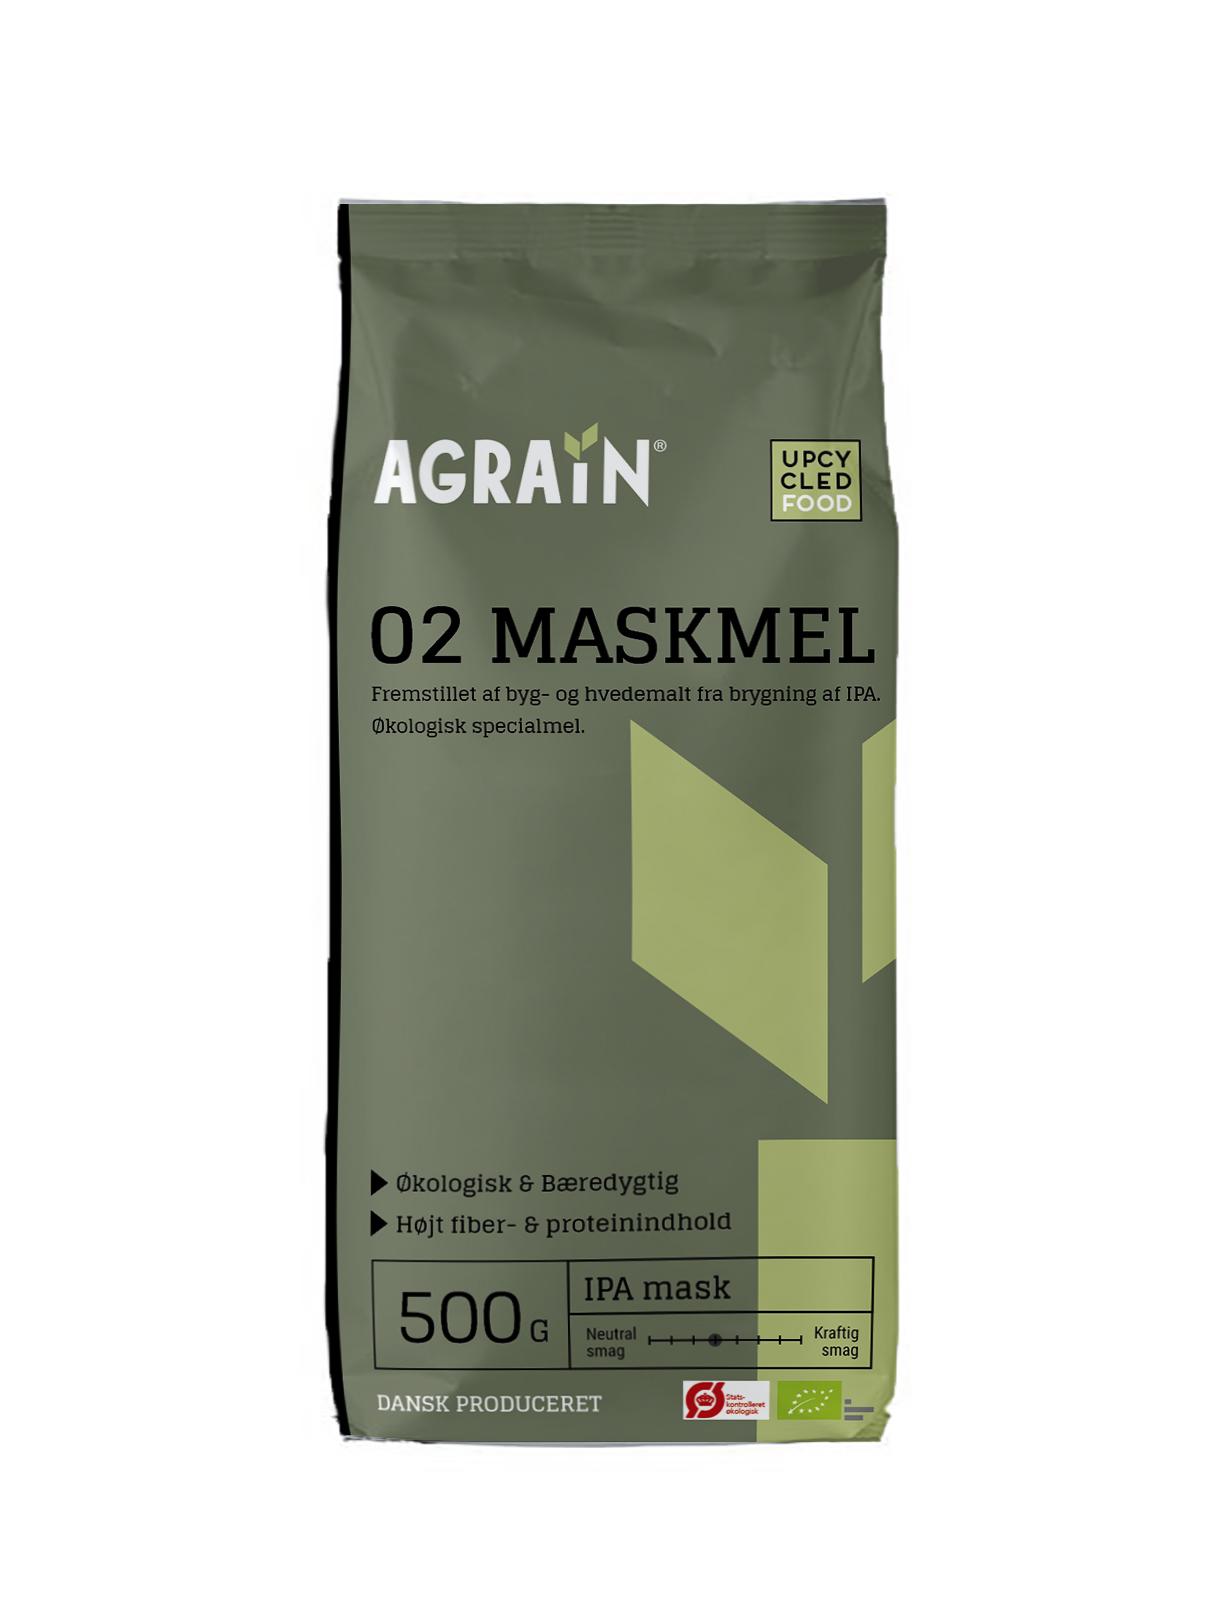 Agrain 02 Maskmel IPA